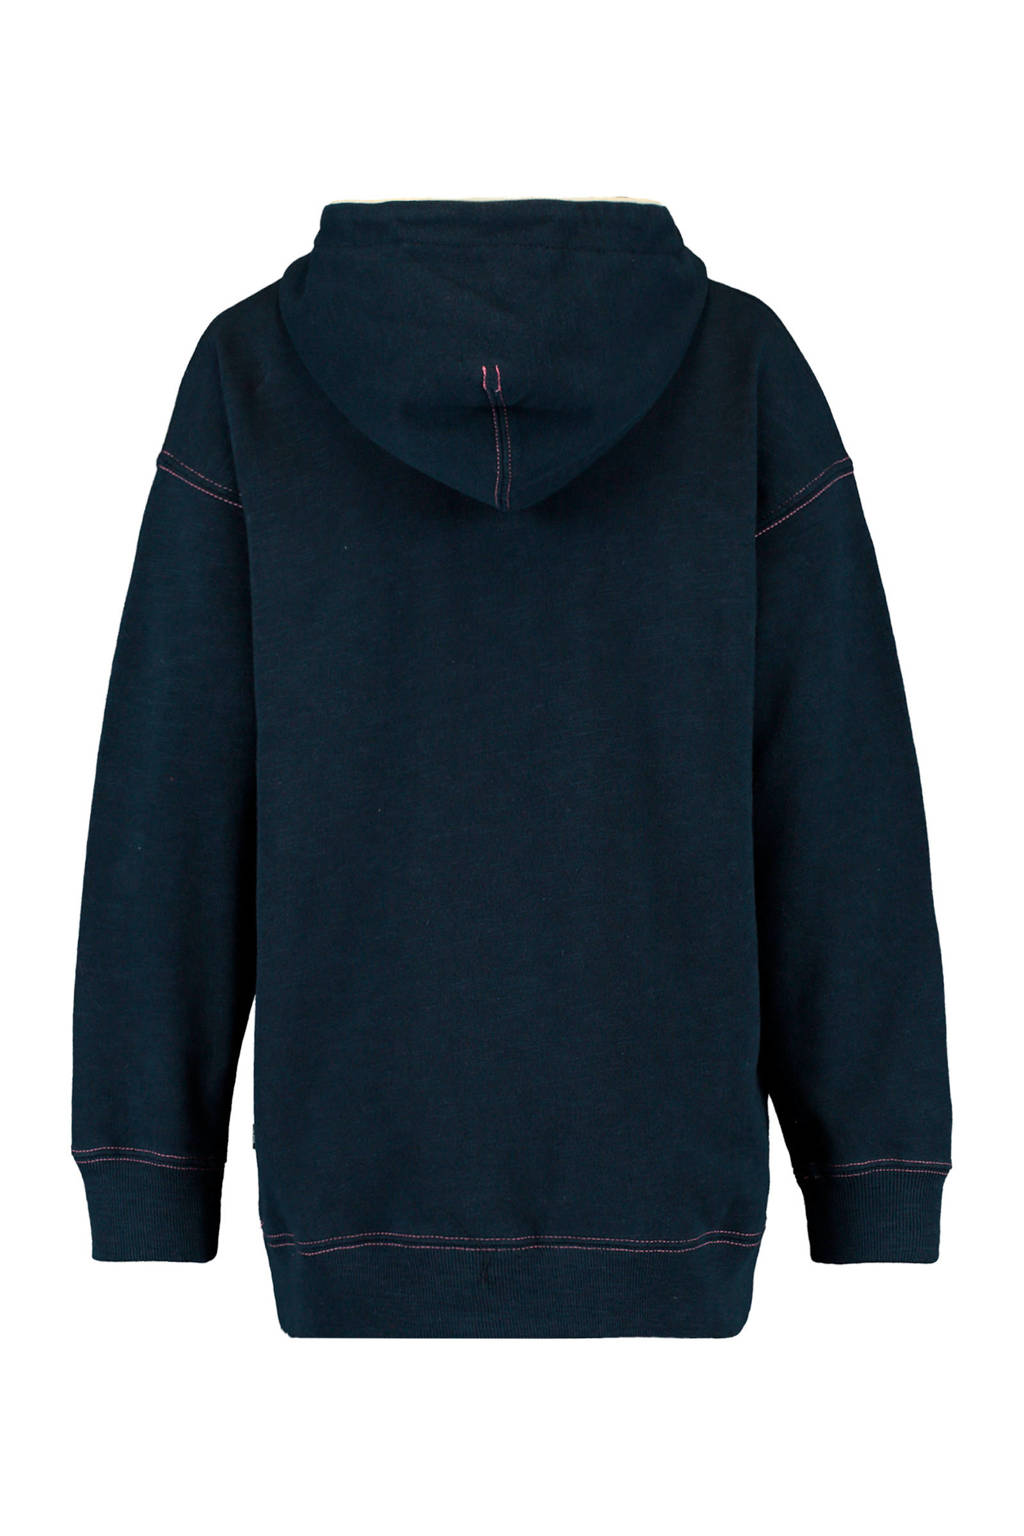 America Today Junior sweater